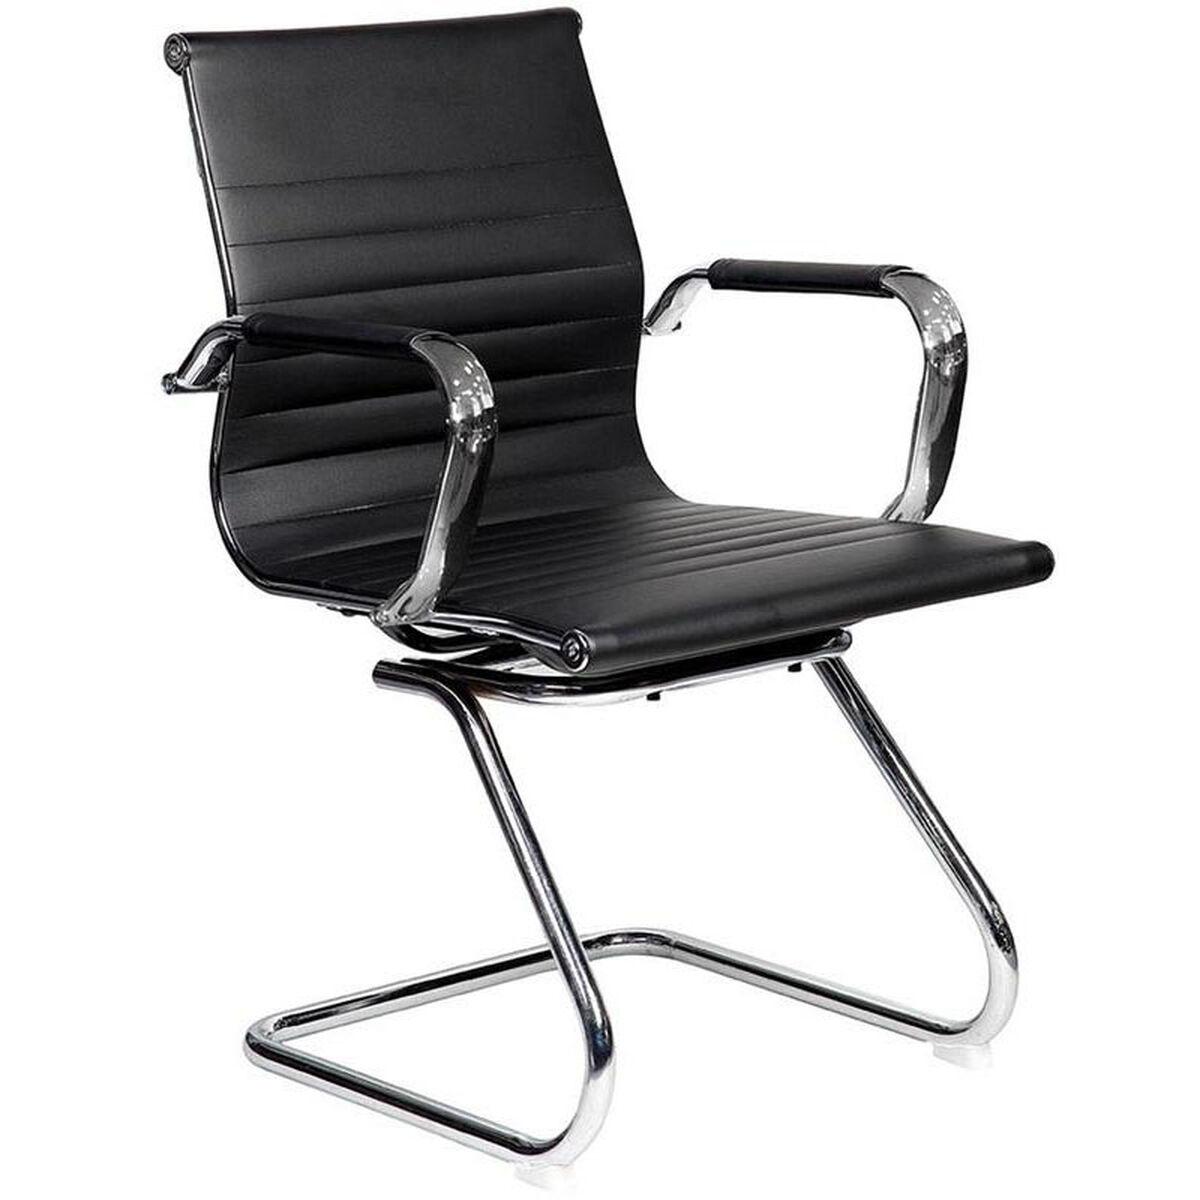 modern visitor office chair rta 4602v bk churchchairs4less com